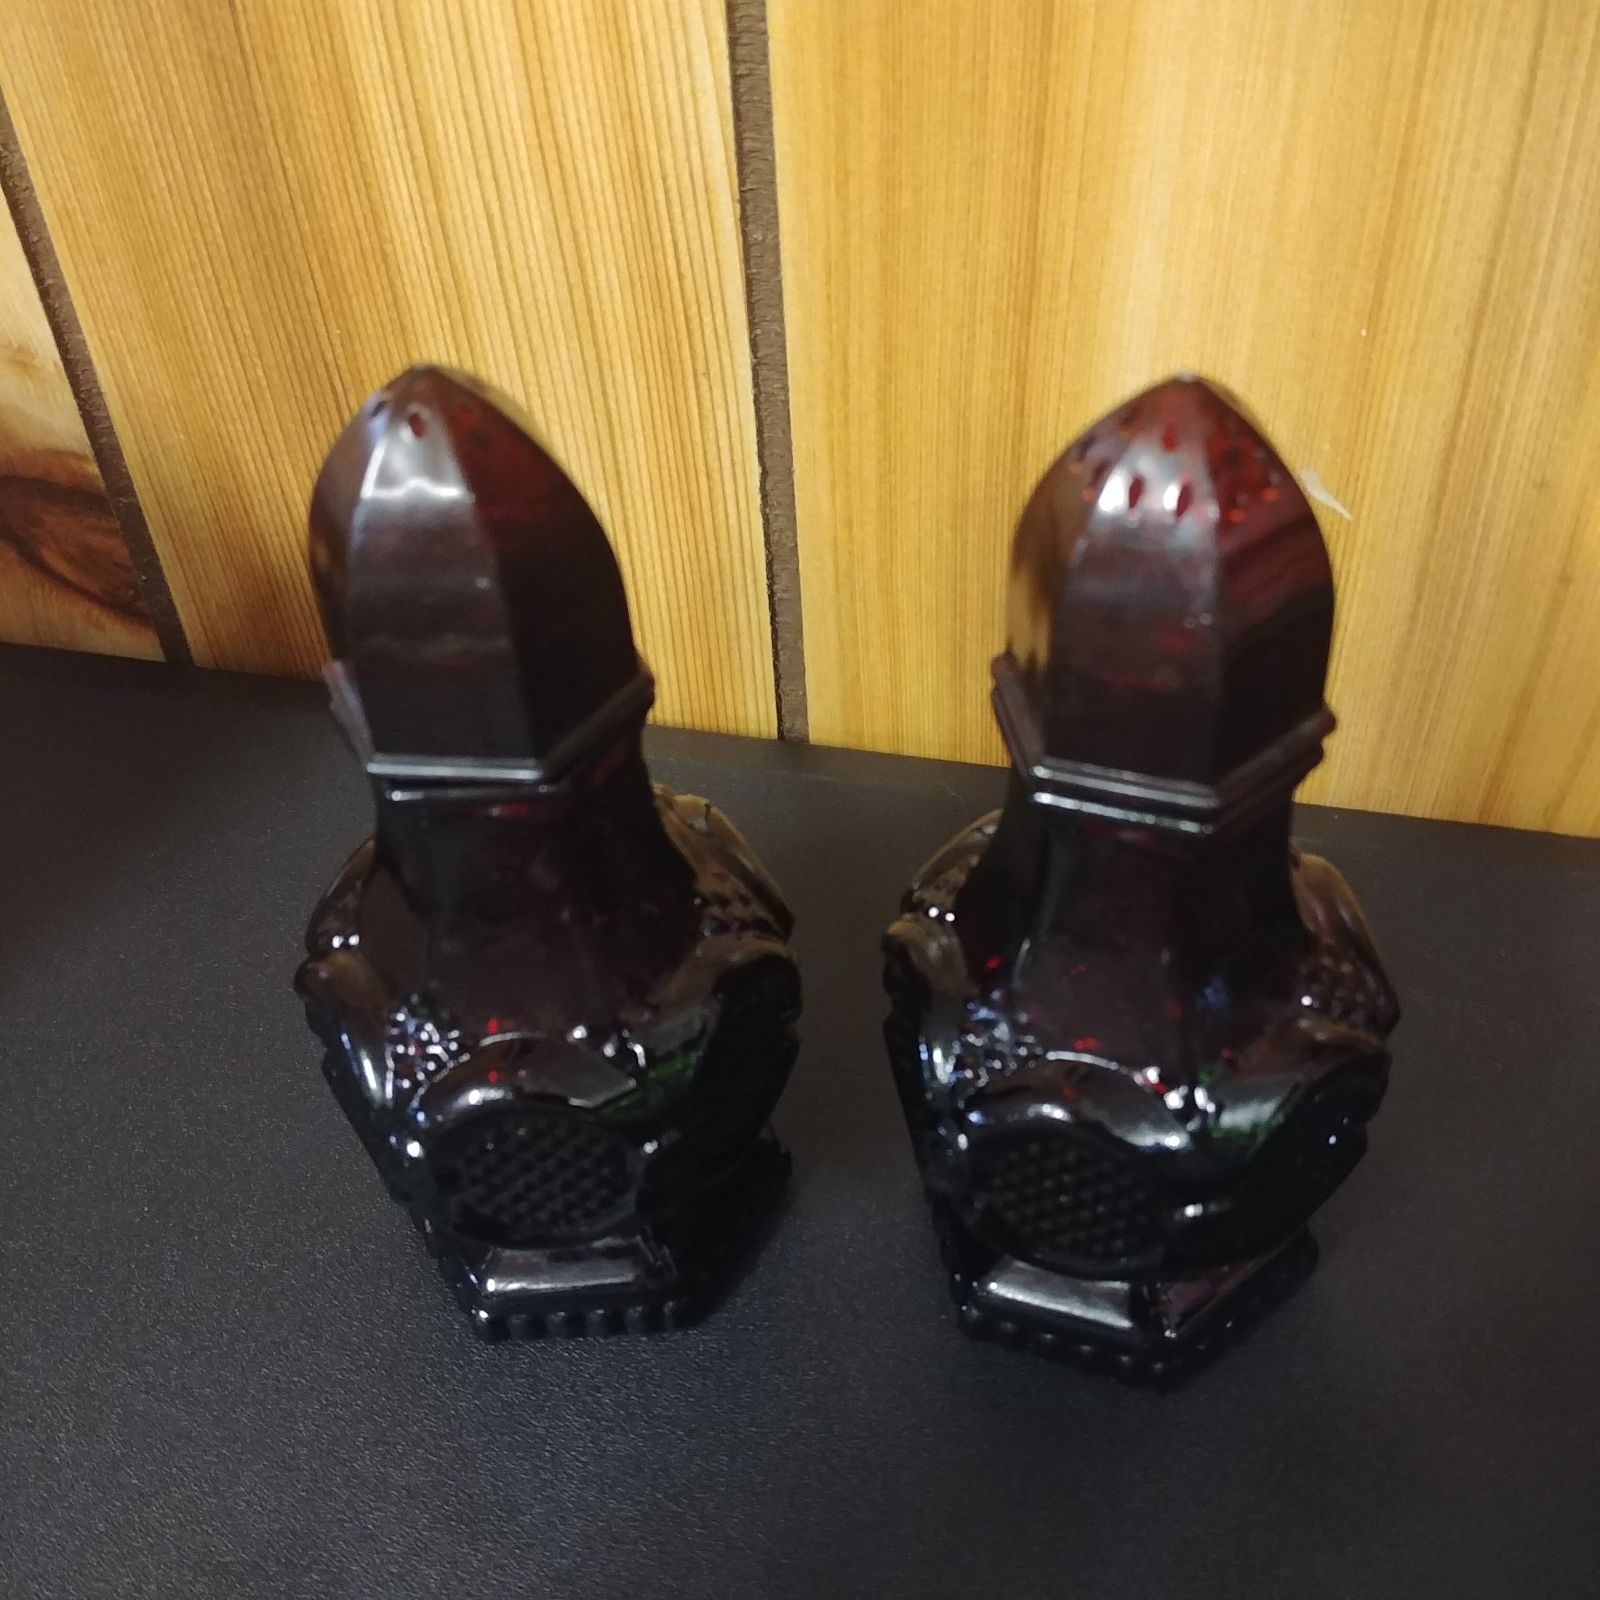 Vintage Red Glass Salt & Pepper Shakers